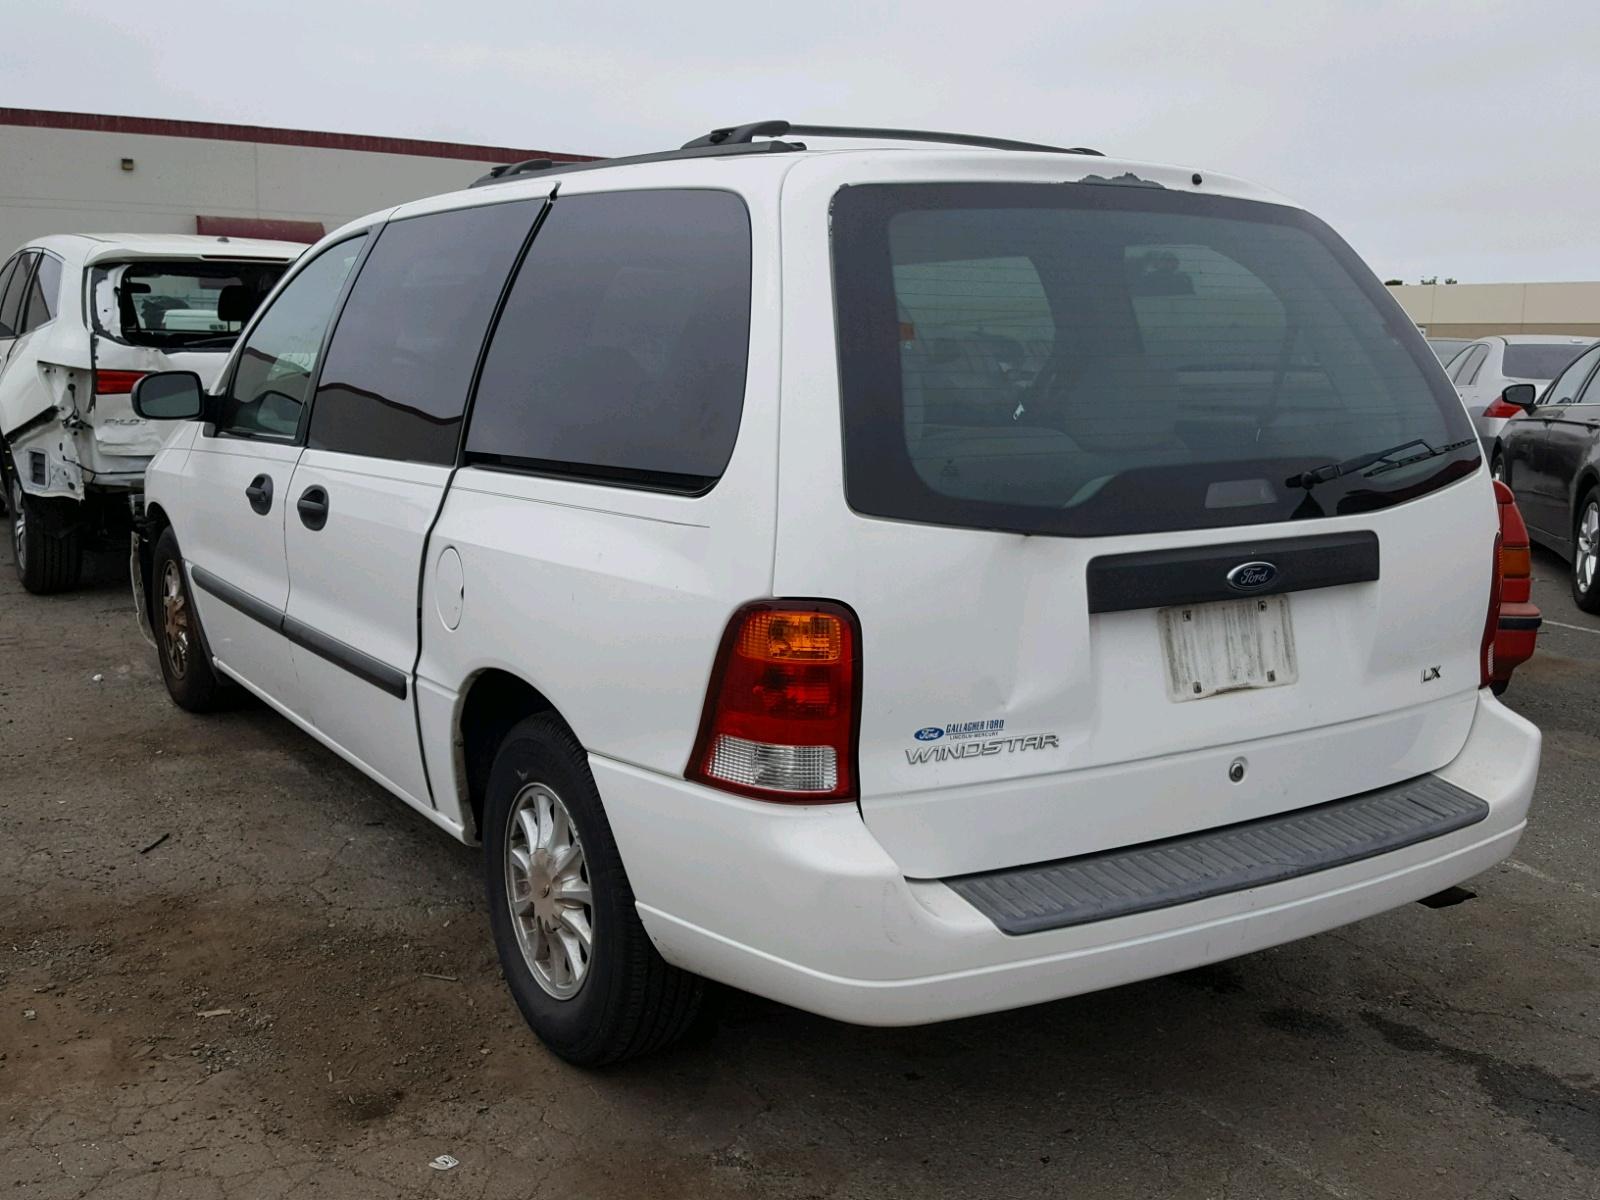 2fmza51483ba98180 2003 White Ford Windstar L On Sale In Ca Lx 38l Angle View